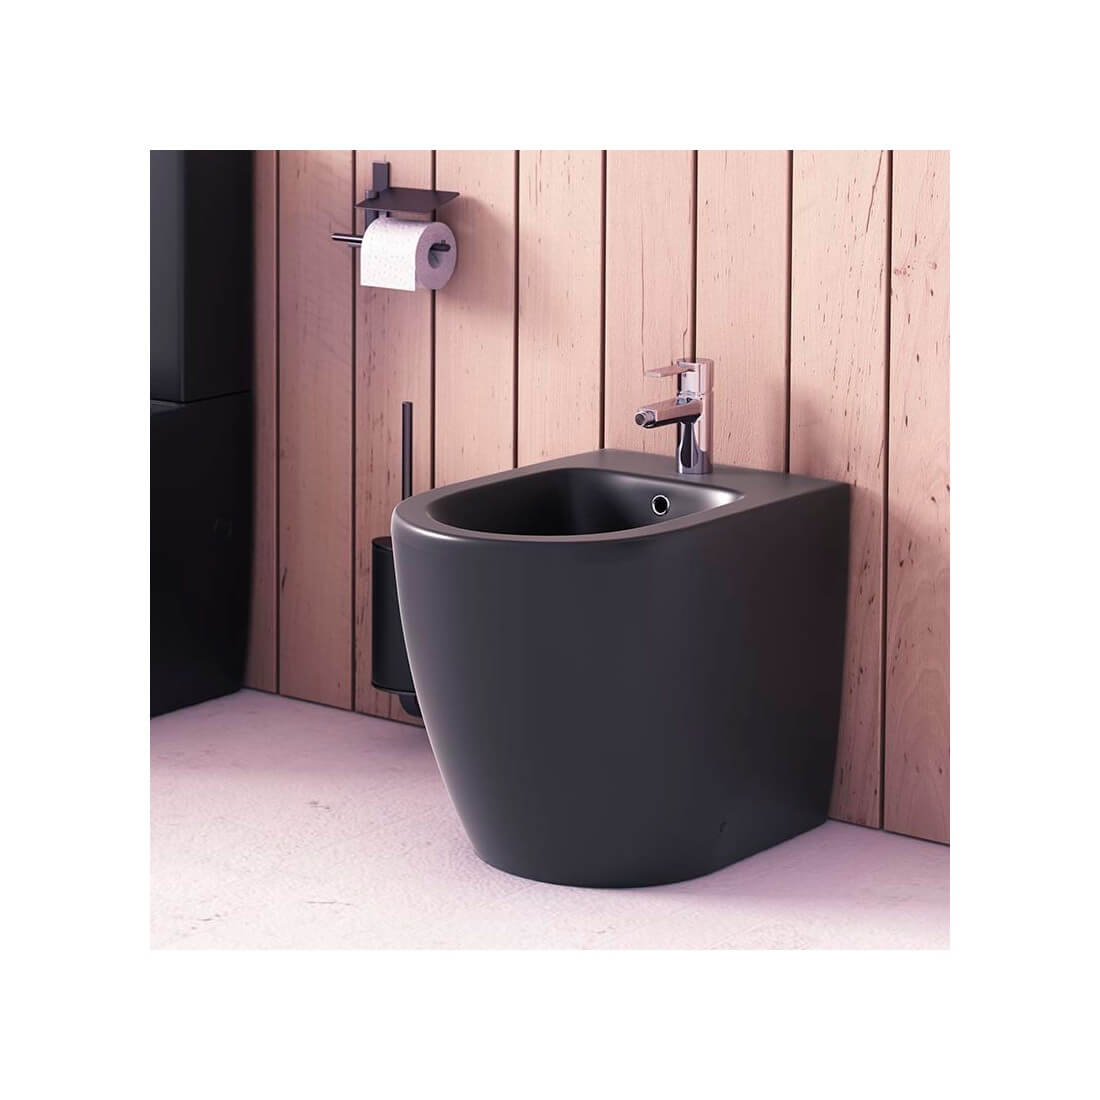 ▷ Comprar bidet para baño Verona en acabados mate. Gris, negro, blanco